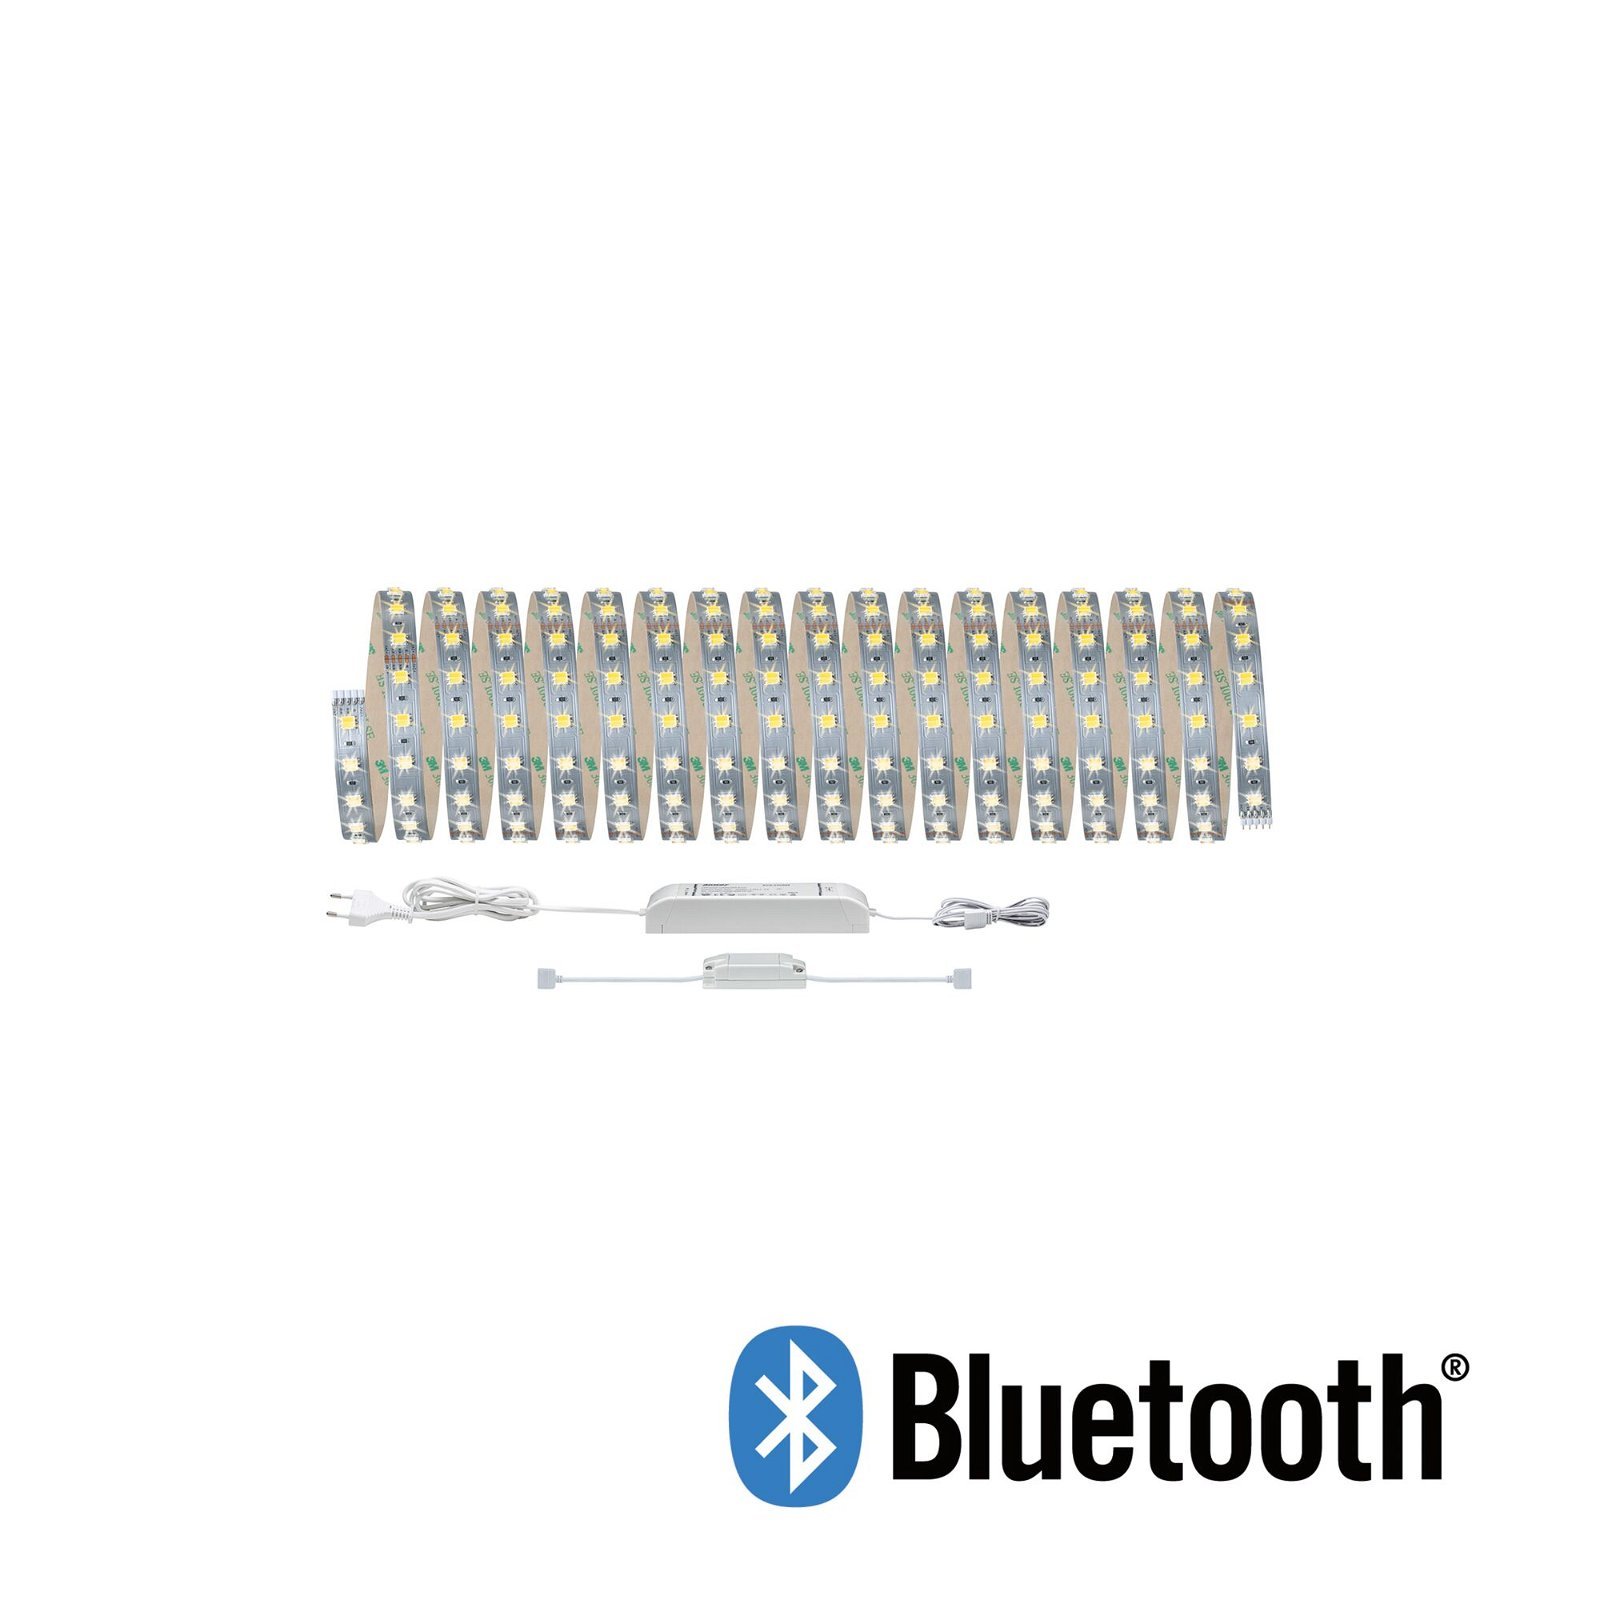 MaxLED 500 LED Strip Smart Home Bluetooth Tunable White 10m 47W 550lm/m Tunable White 80VA